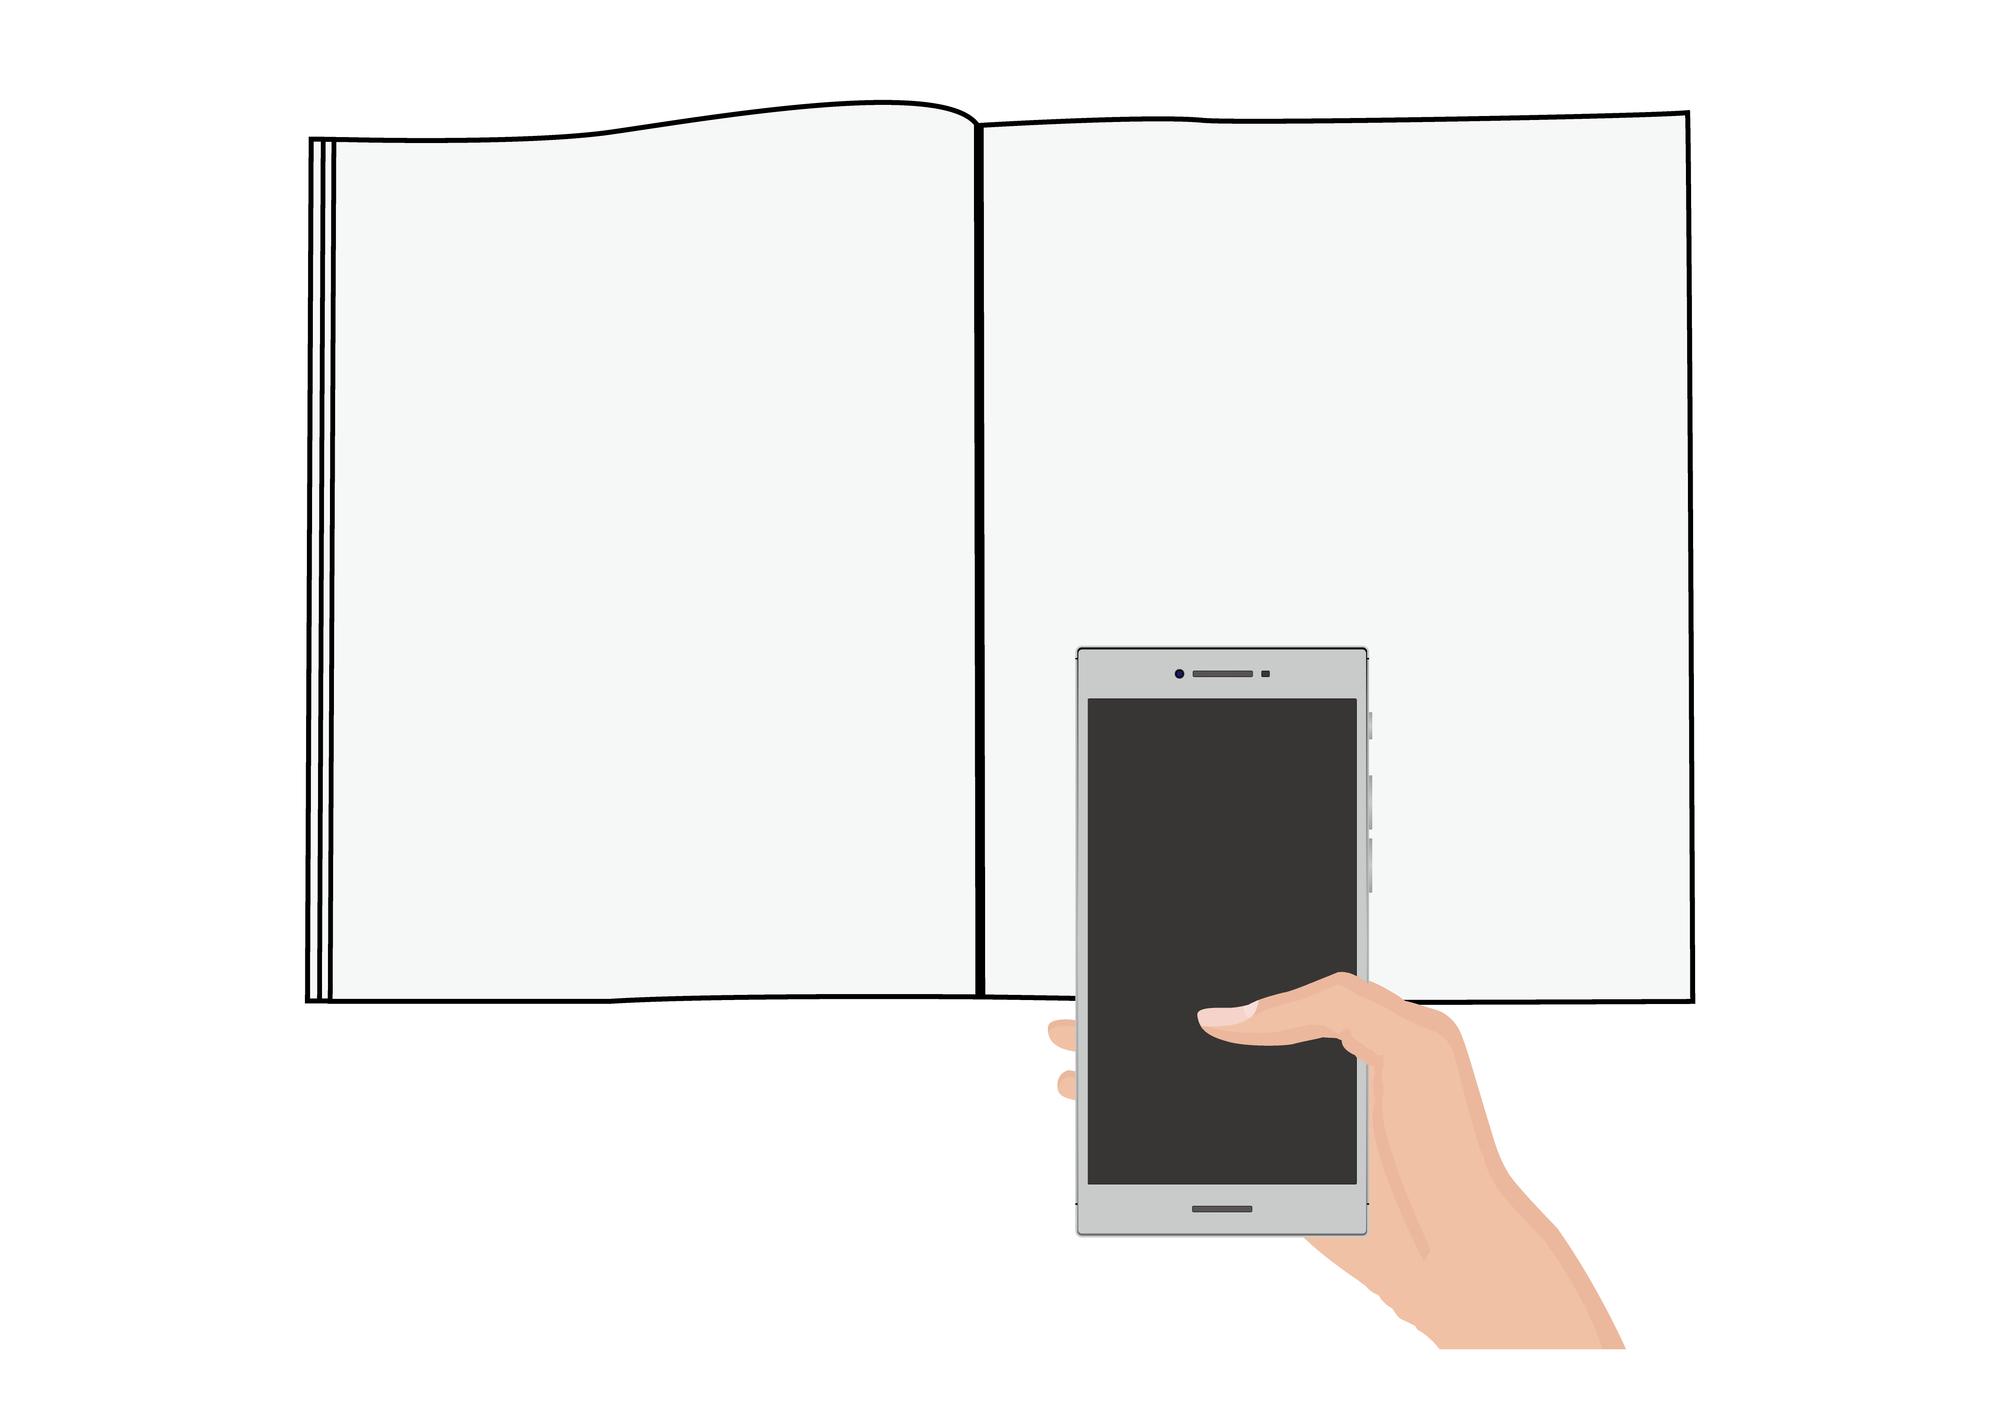 AndroidOSの基本機能を7つ紹介|AndoroidとiOSの違いは?のアイキャッチイメージ